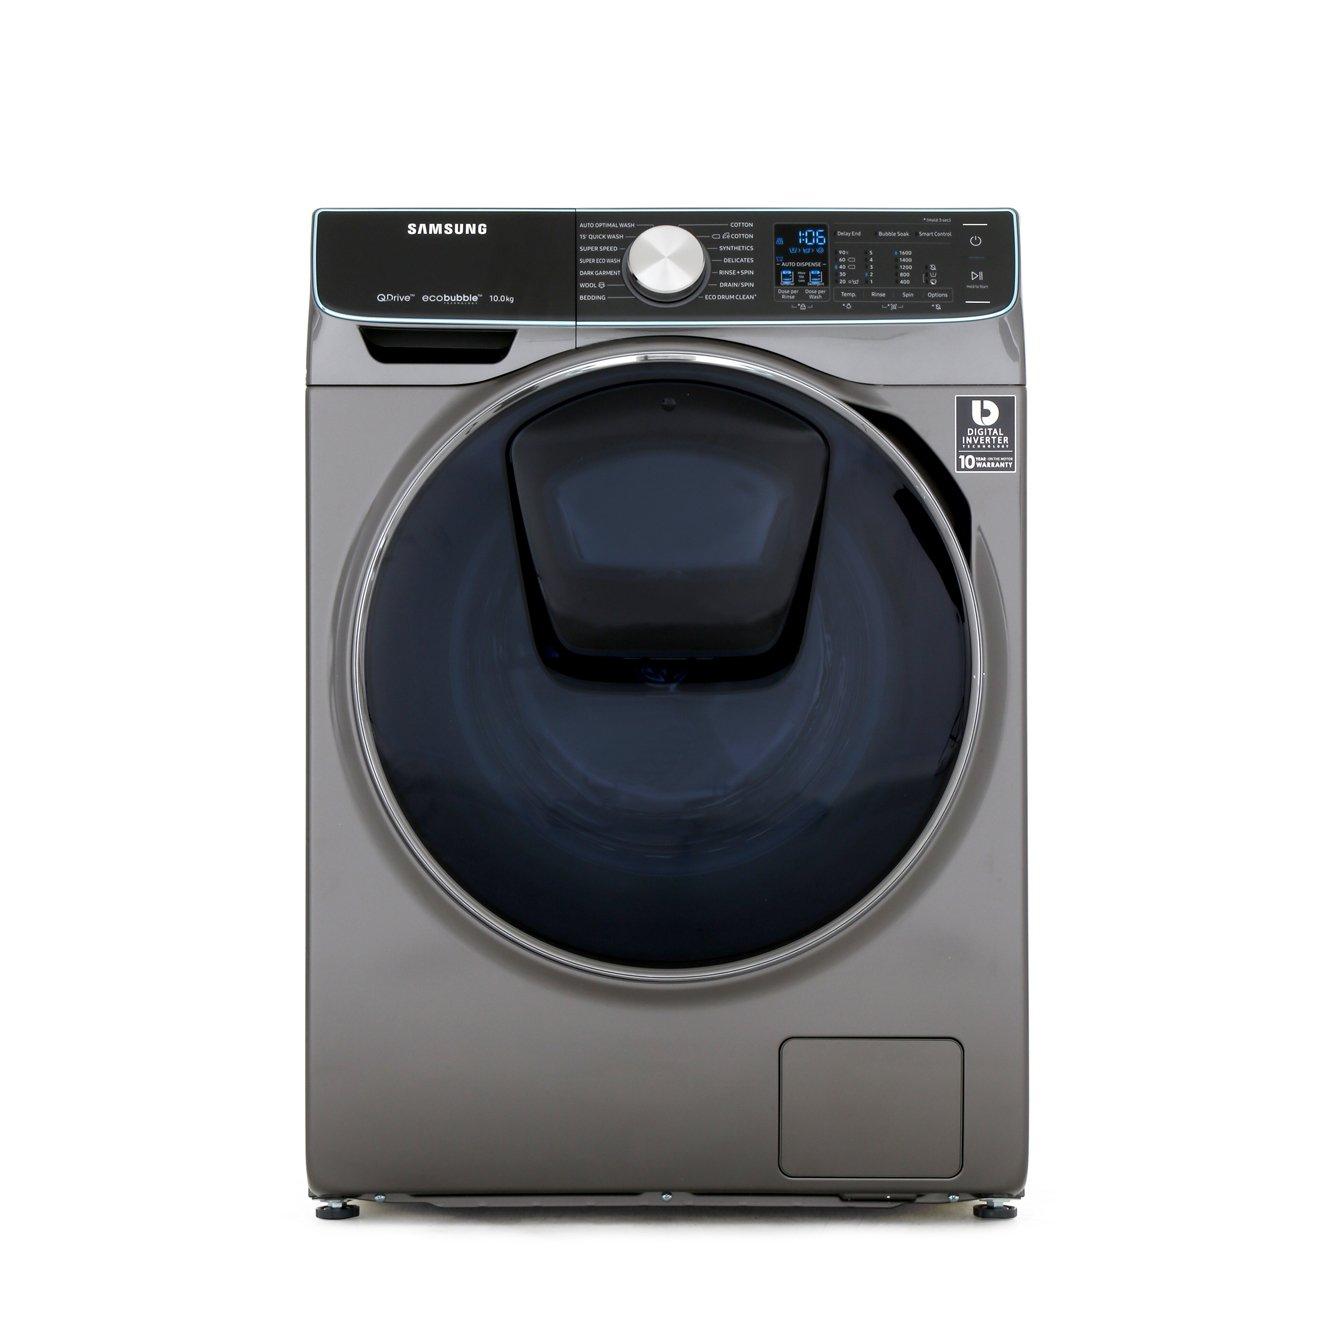 buy samsung quickdrive ww10m86dqoo 10 kg washing machine. Black Bedroom Furniture Sets. Home Design Ideas